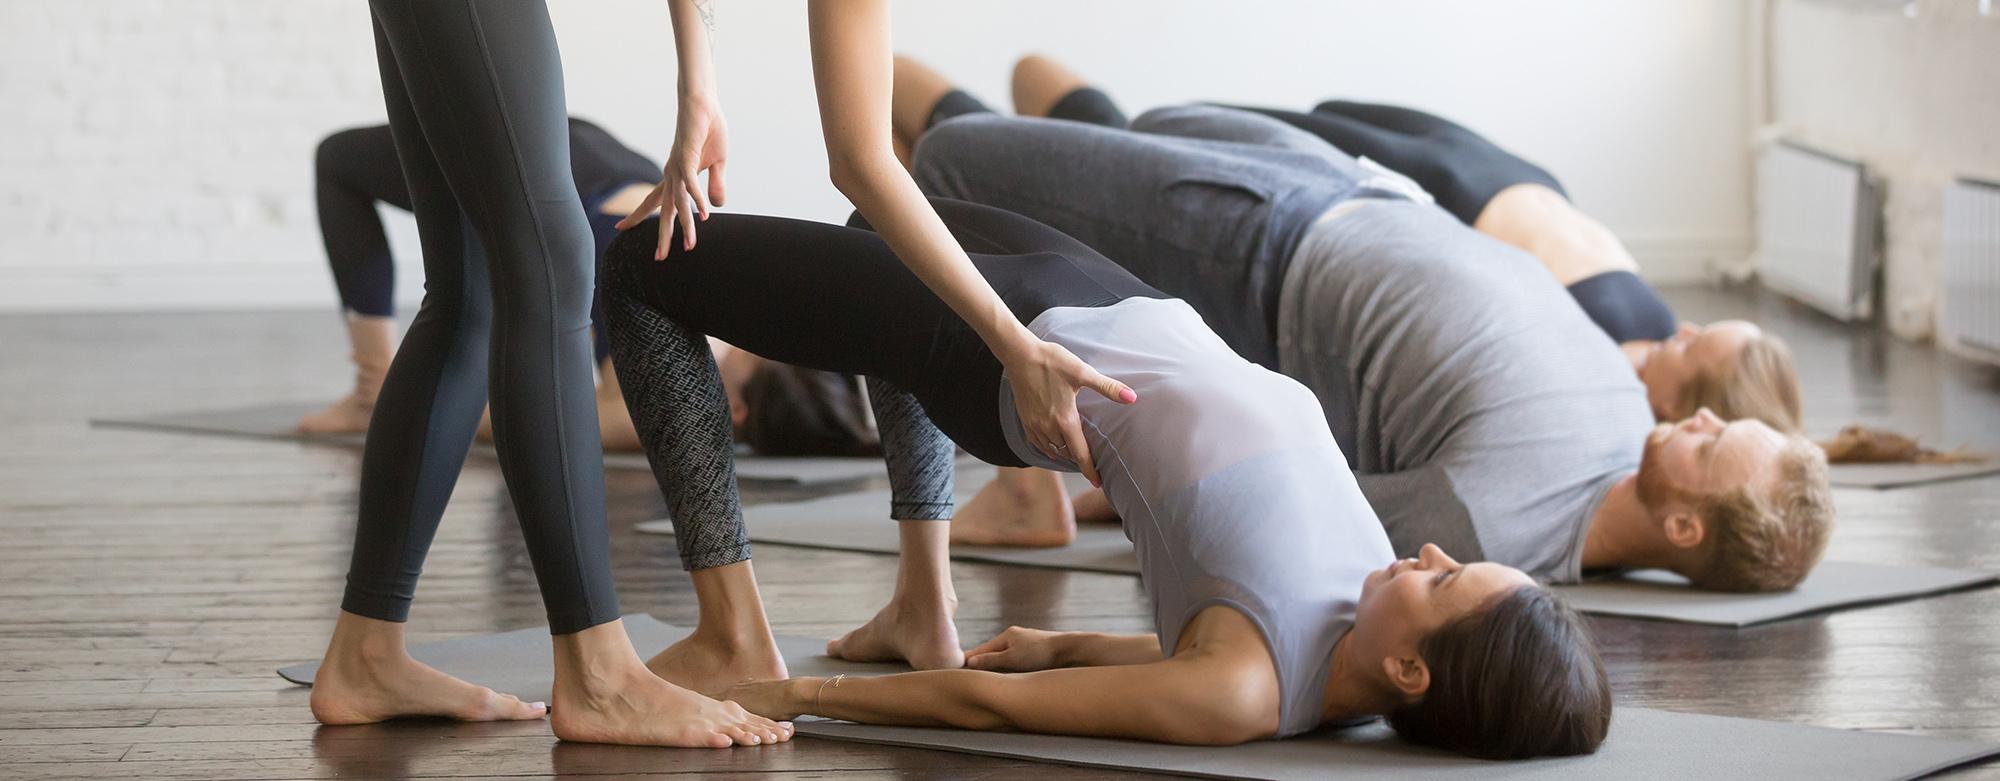 Yoga Journey hot yoga